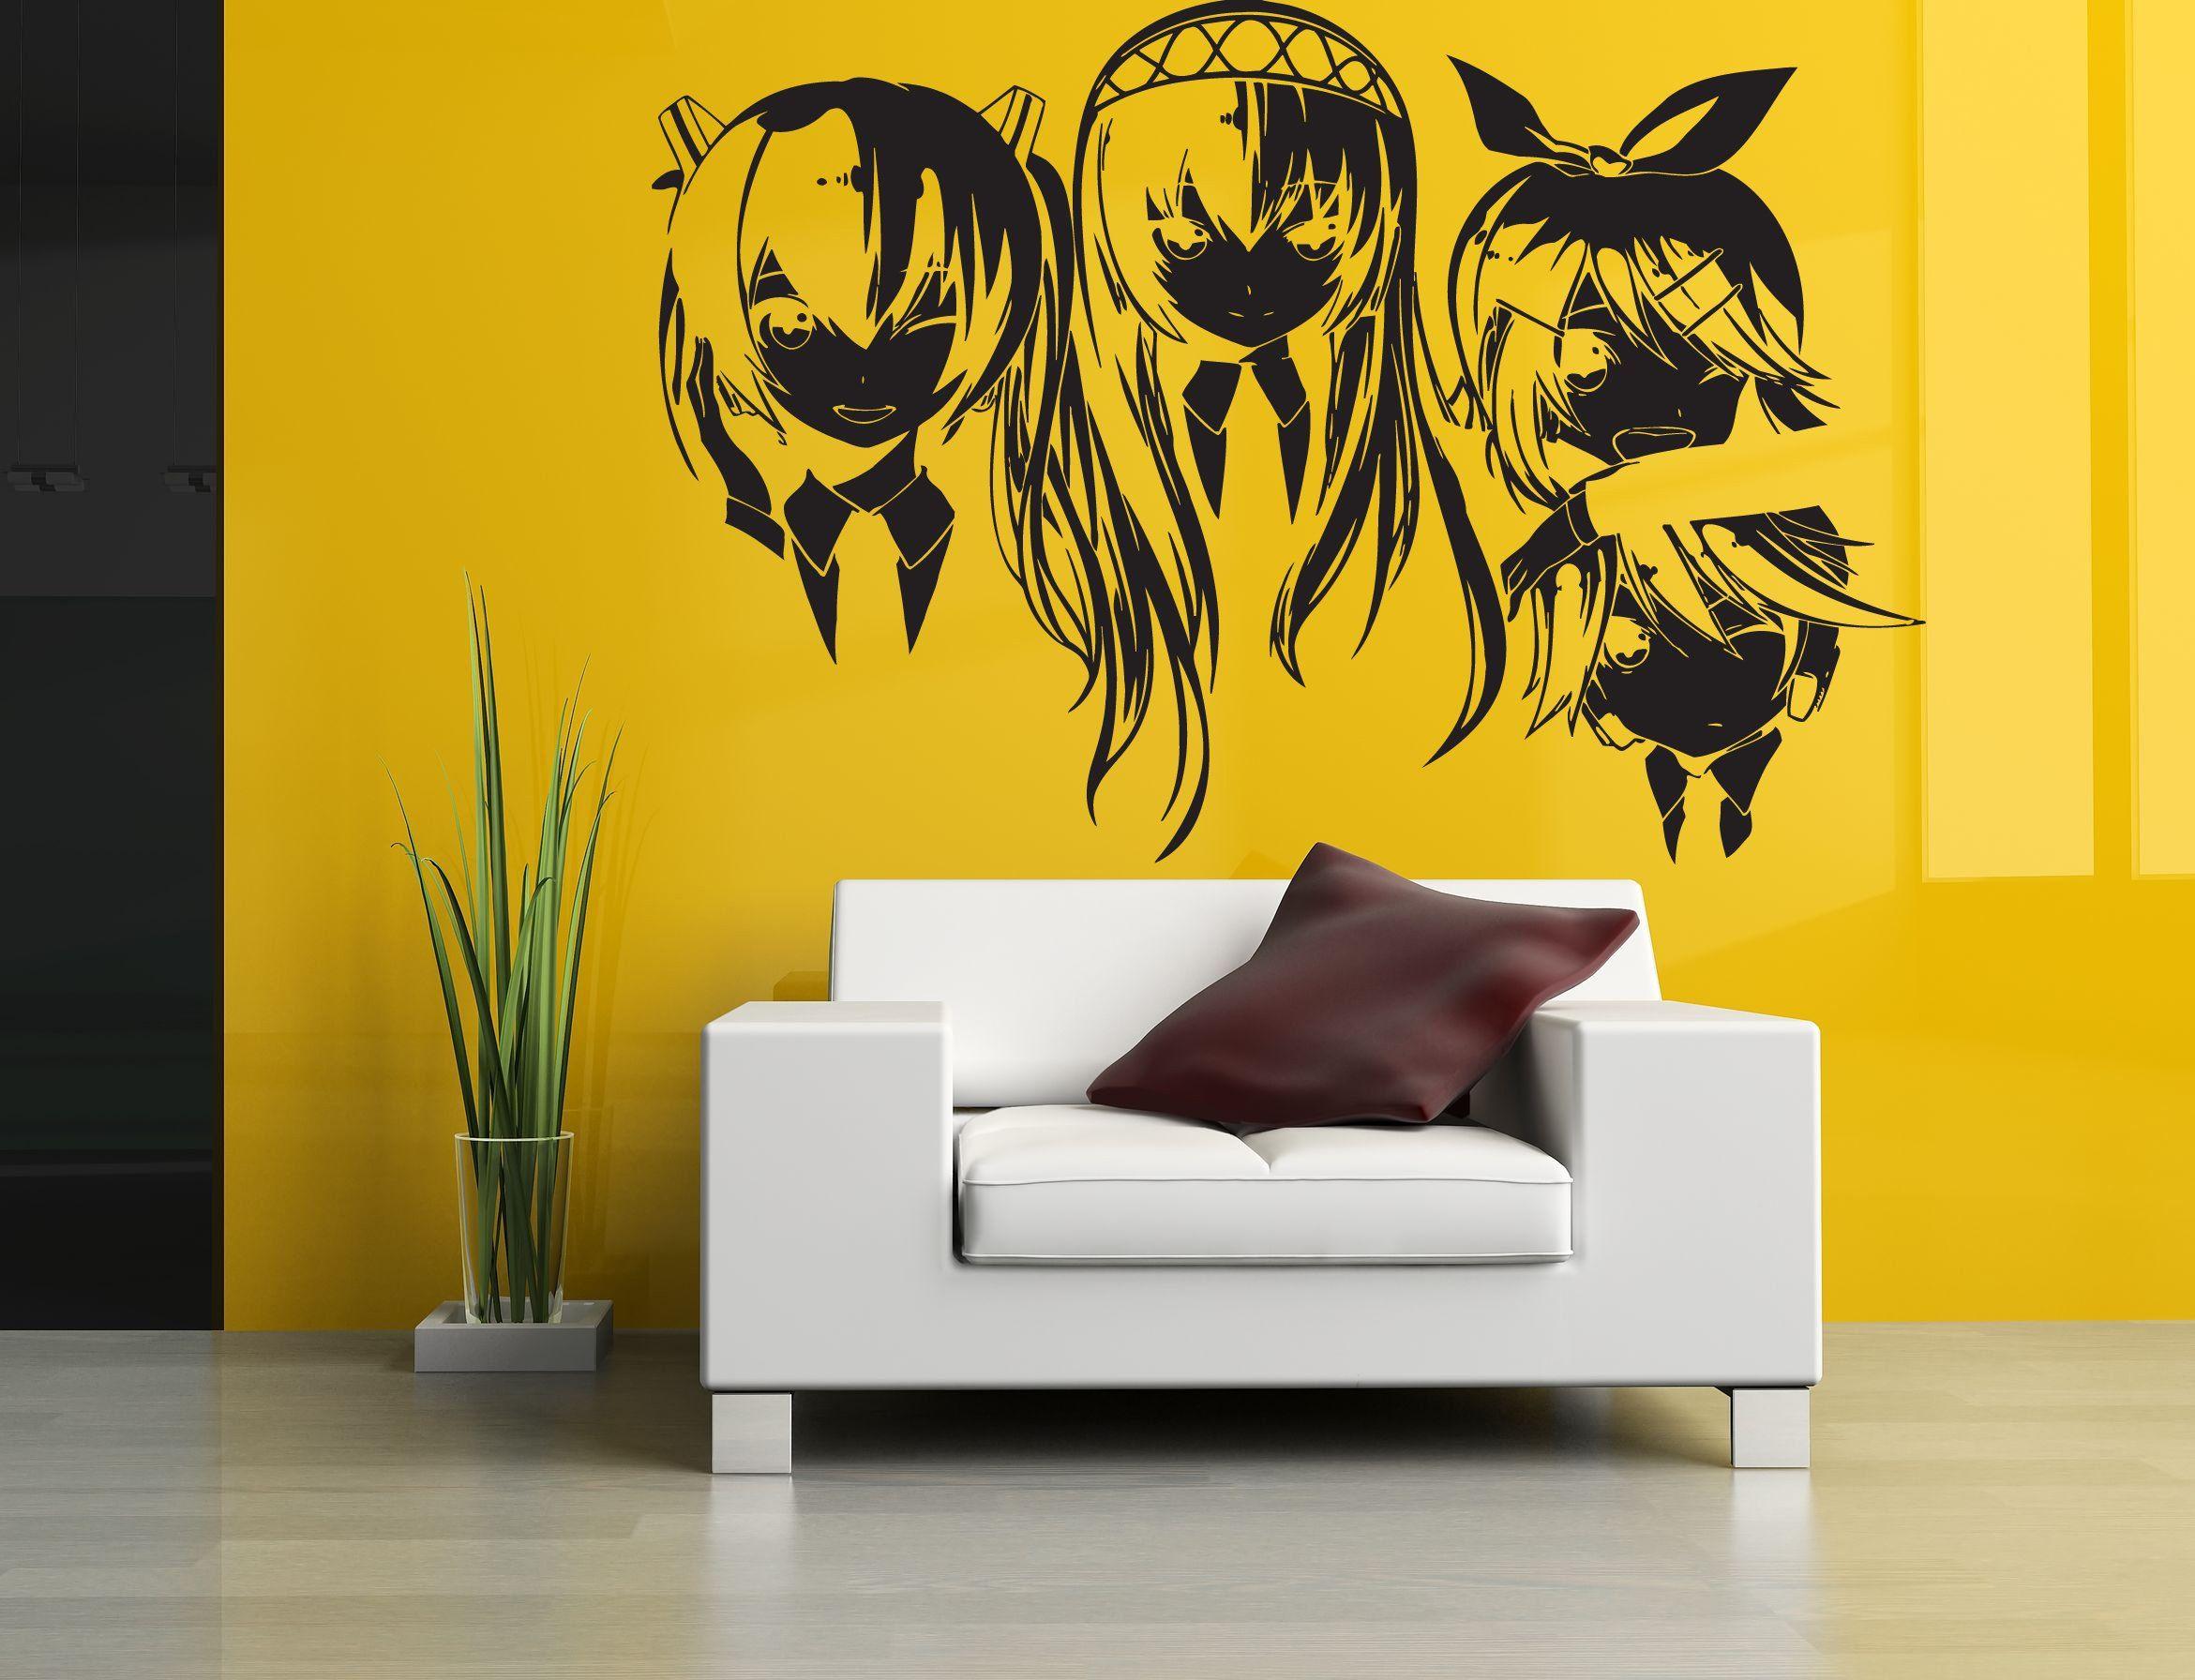 Wall Room Decor Art Vinyl Sticker Mural Decal Anime Hentai Manga 3 ...